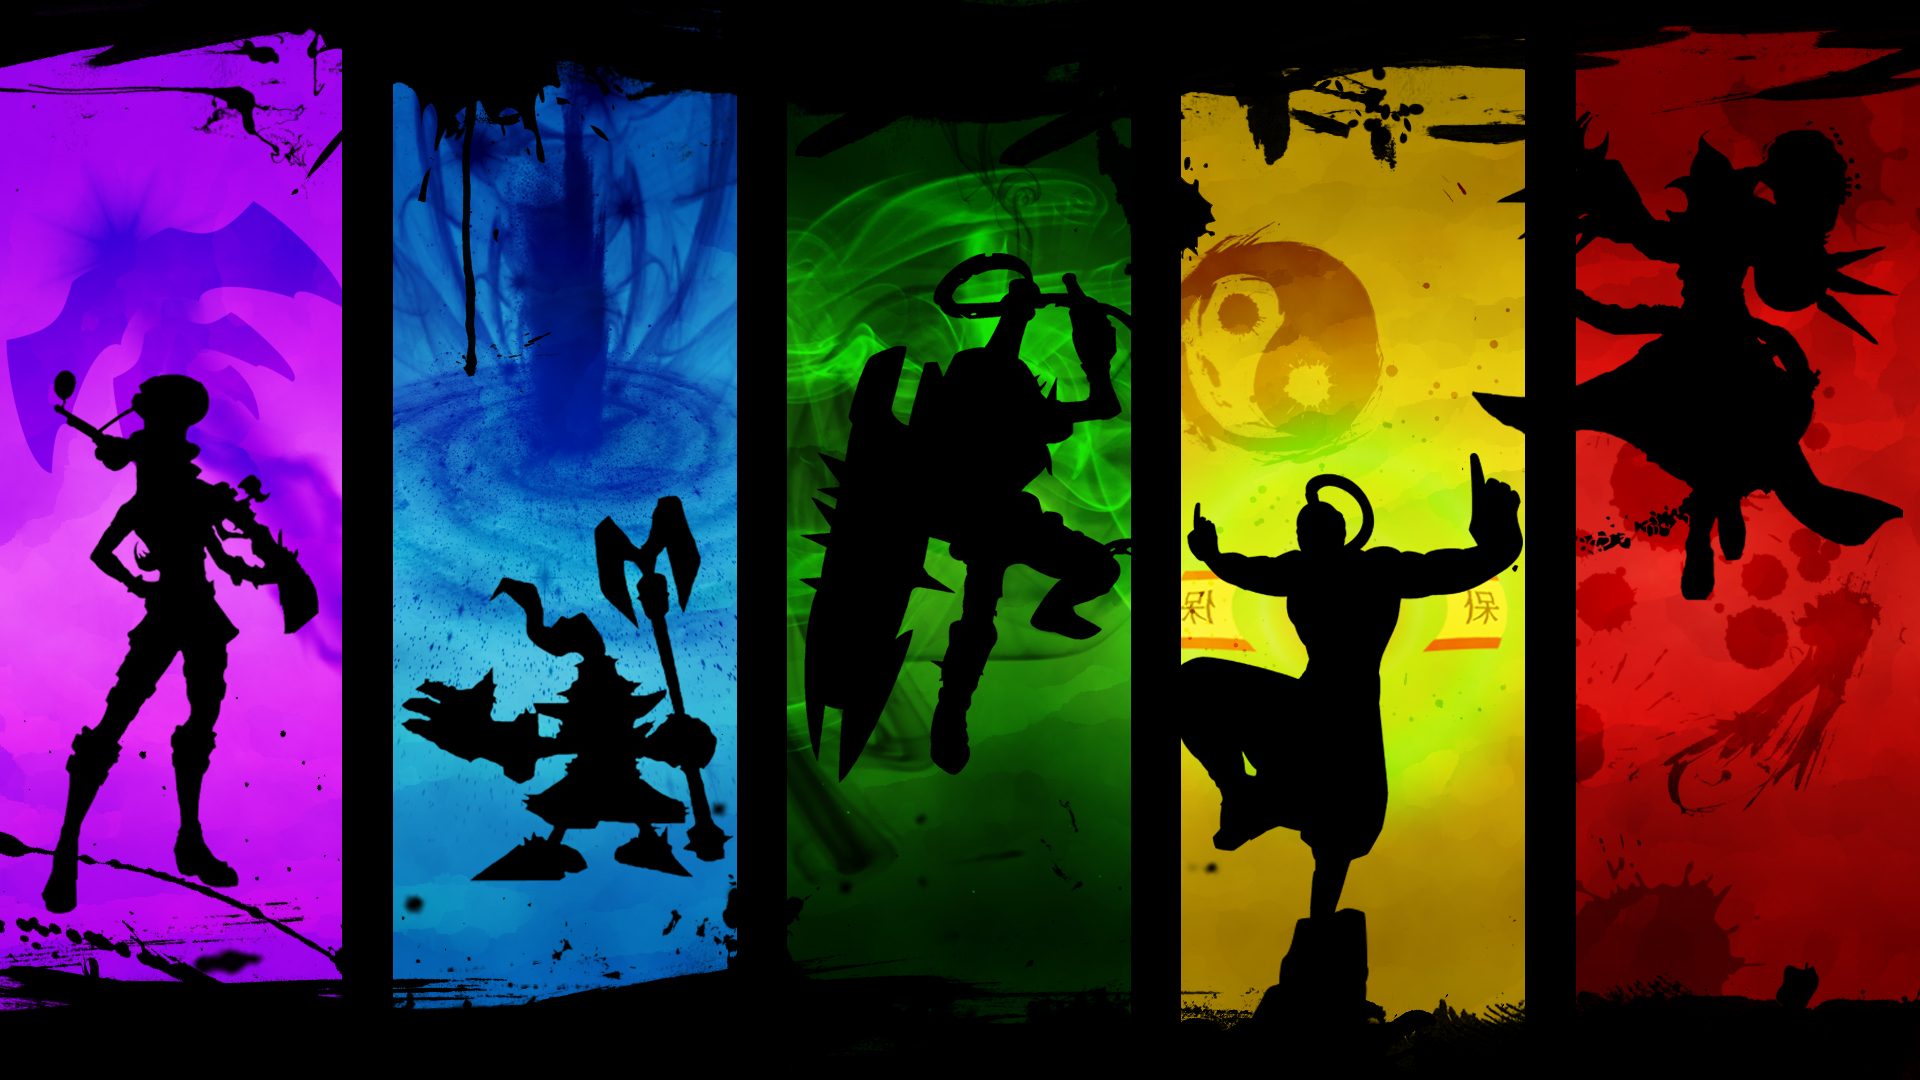 15 singed league of legends hd wallpapers background - League desktop backgrounds ...